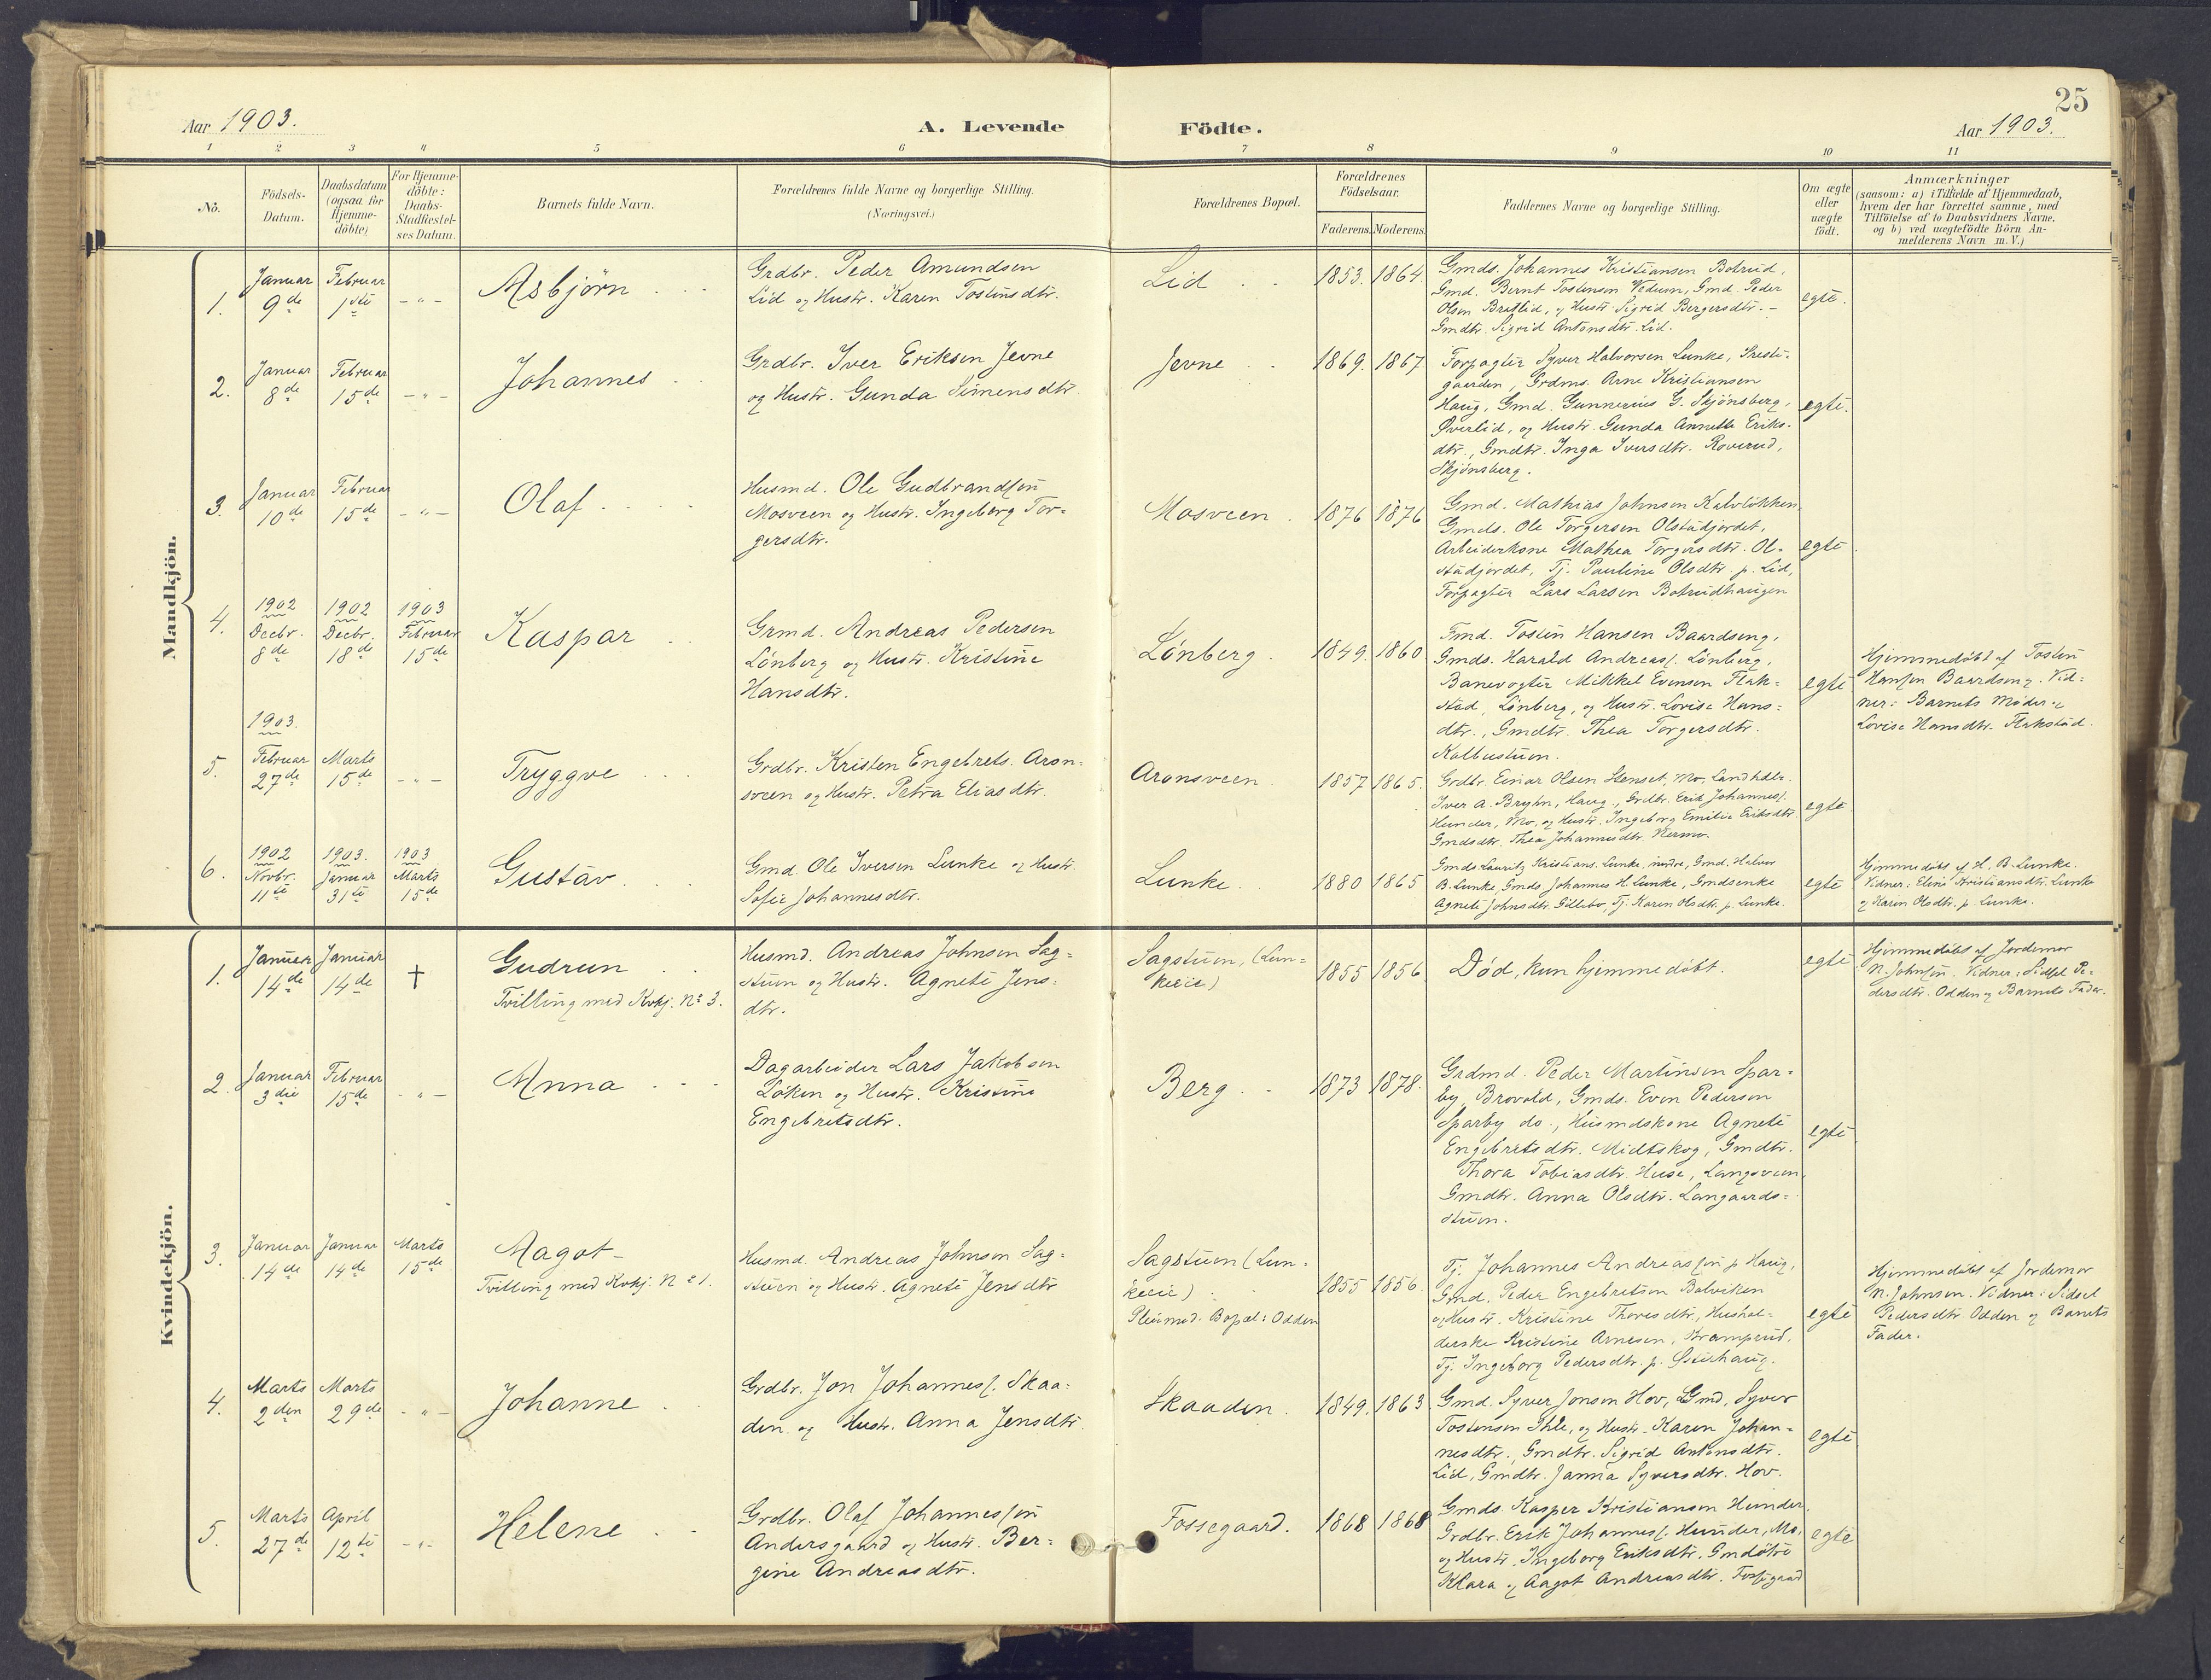 SAH, Øyer prestekontor, Ministerialbok nr. 12, 1897-1920, s. 25